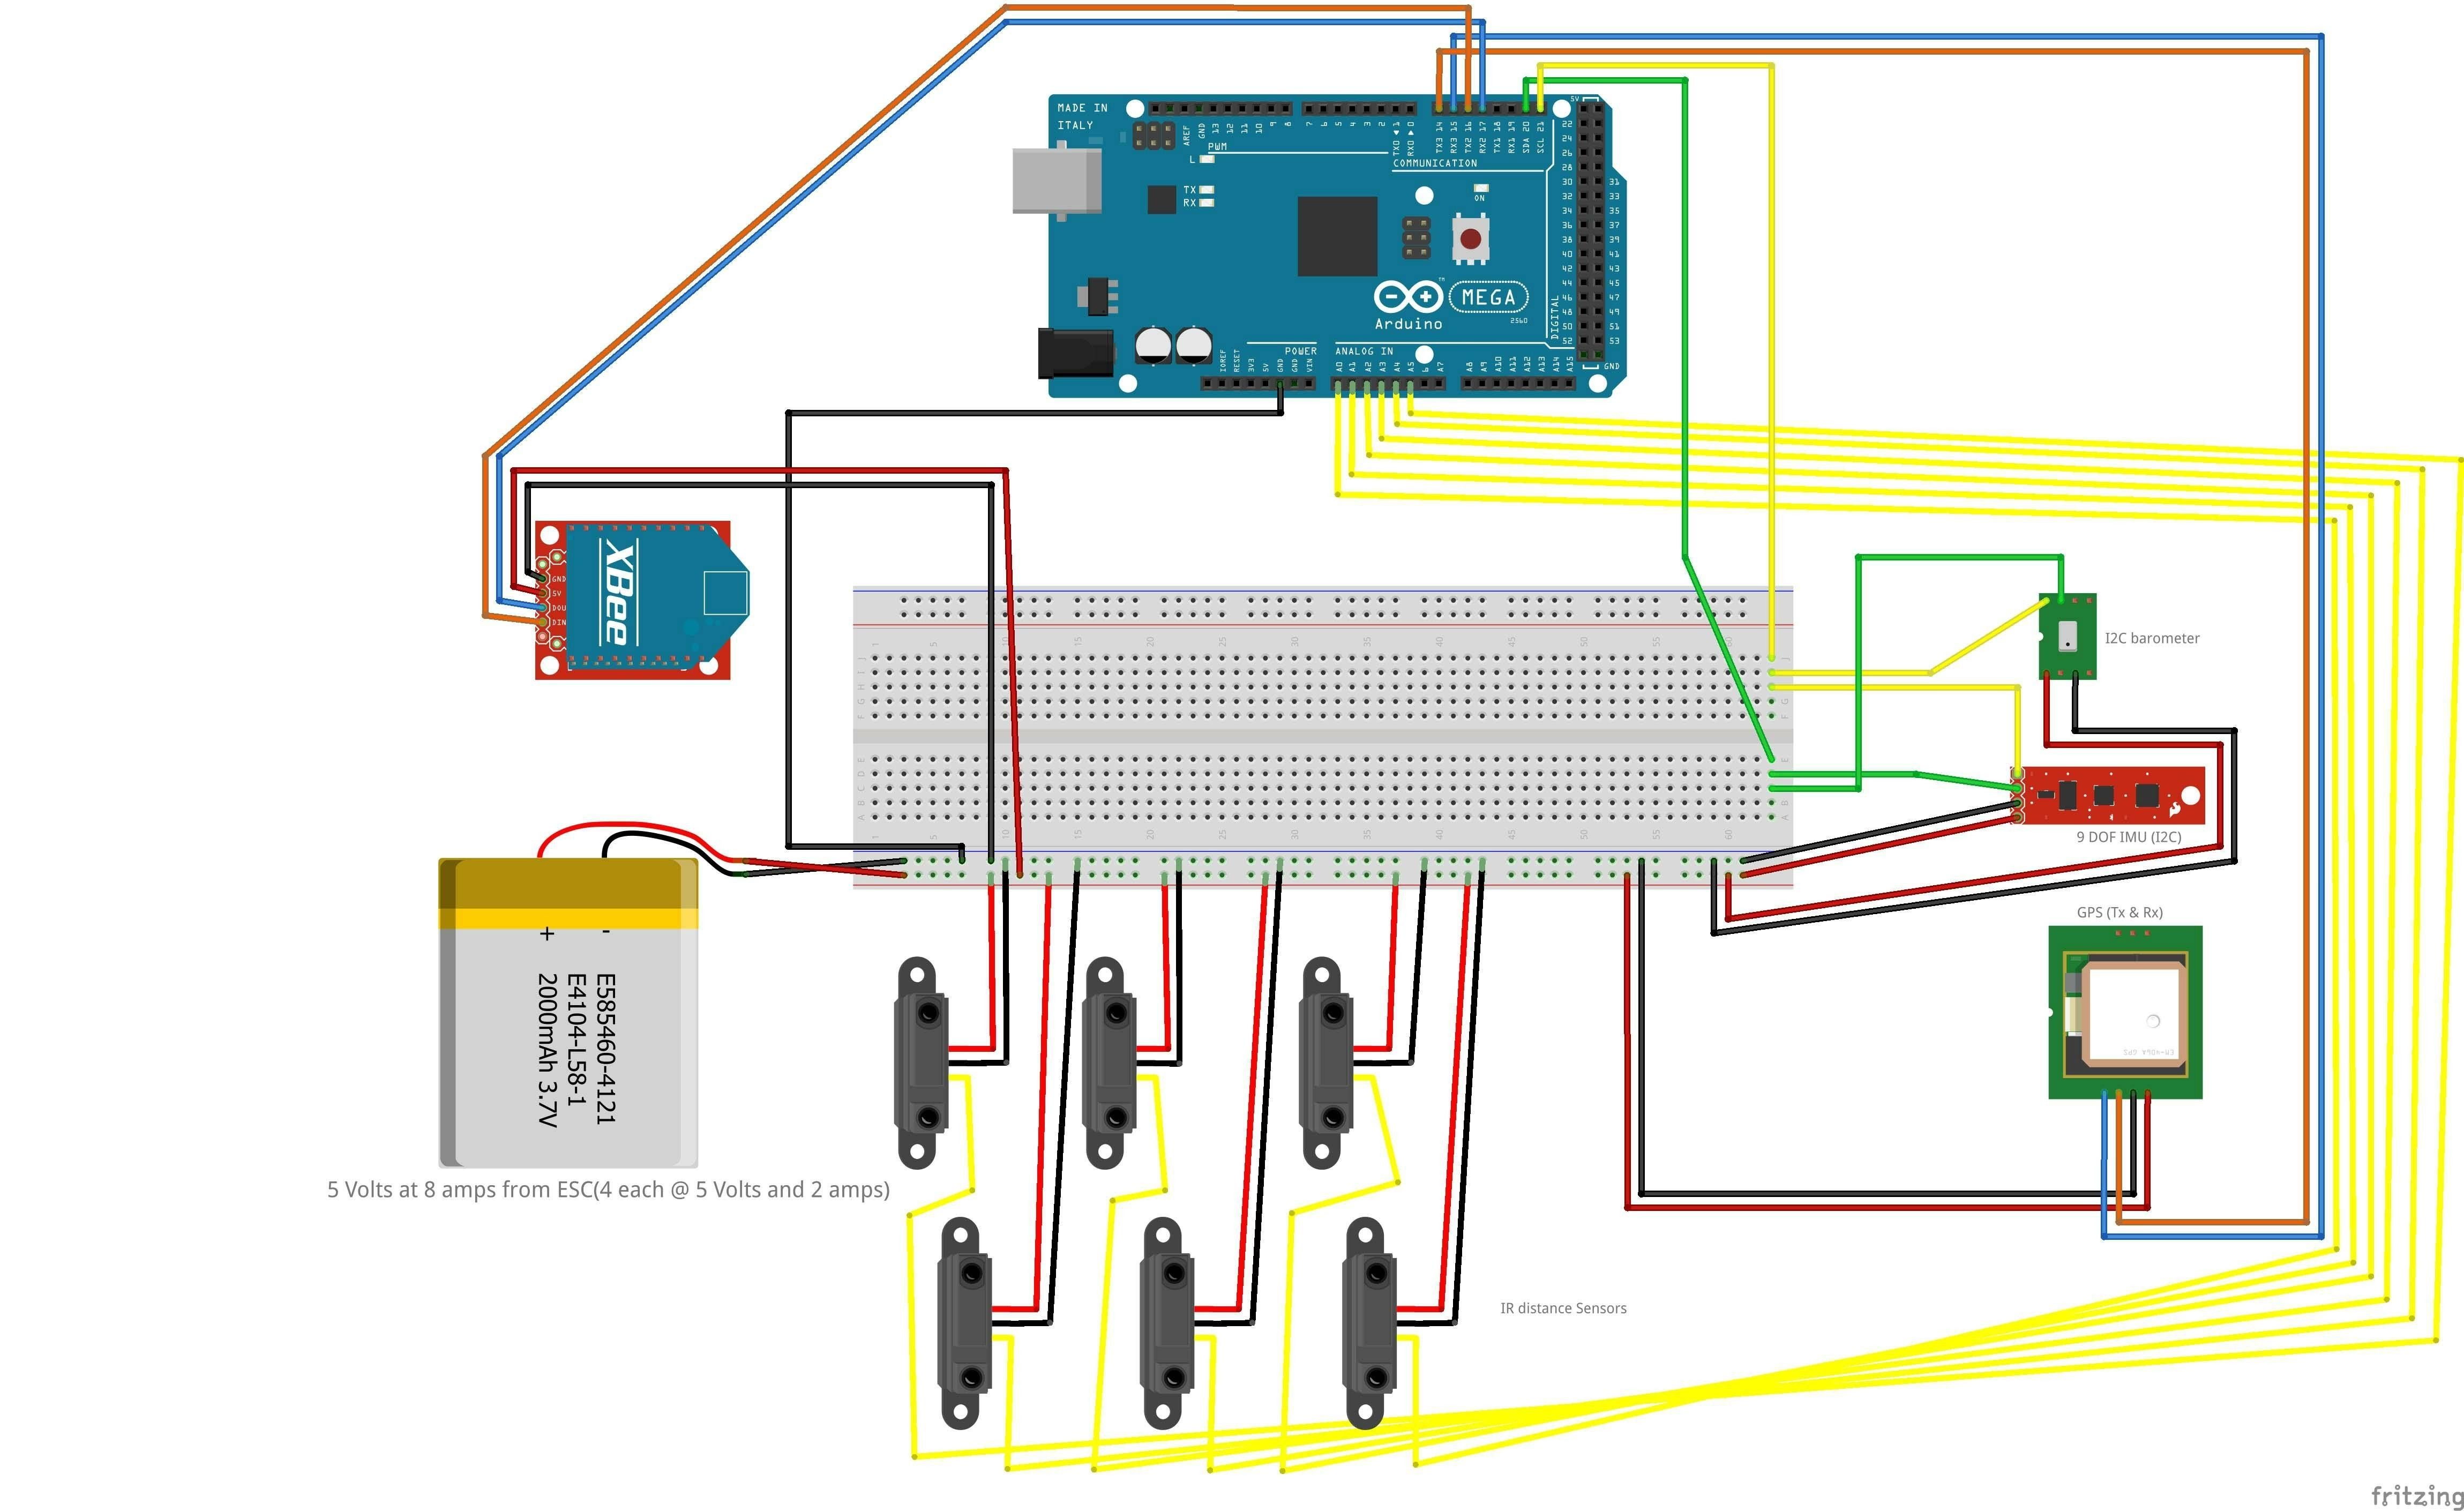 Inspirational Wiring Diagram Quadcopter Diagrams Digramssample Diagramimages Wiringdiagramsample Wiringdiagram Diagram Quadcopter Wire